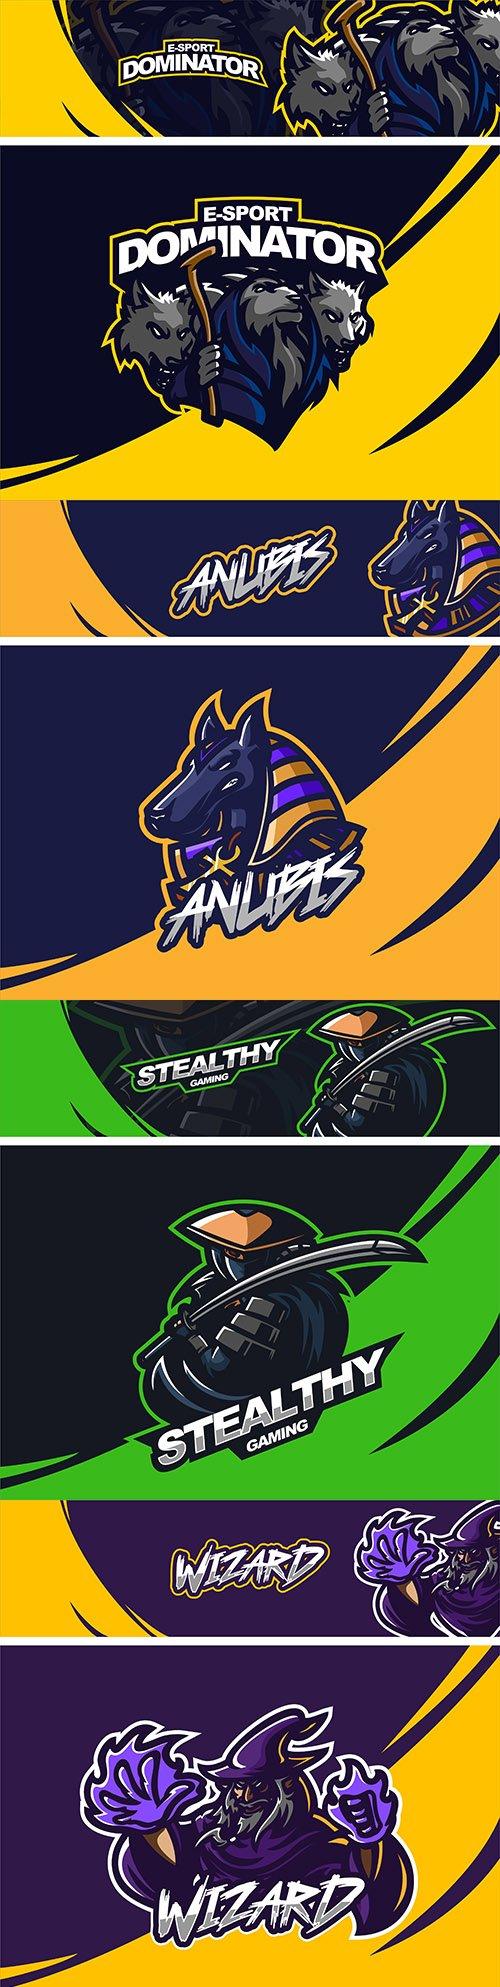 Emblem mascot and Brand name logos design 3